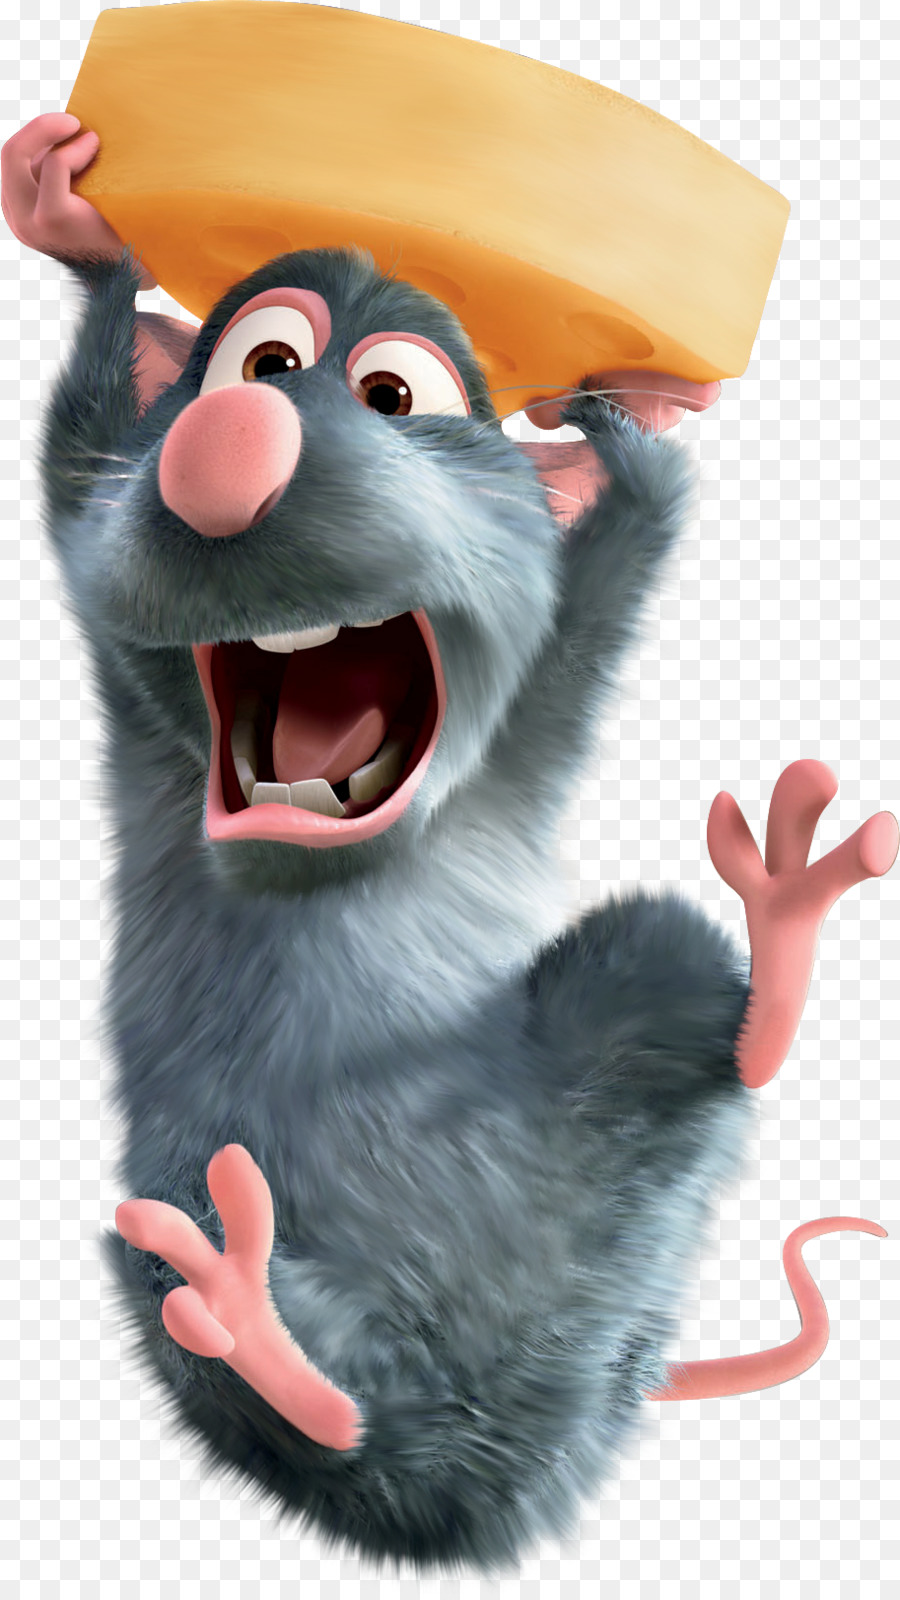 ratatouille film animation pixar wallpaper - rat png download - 913